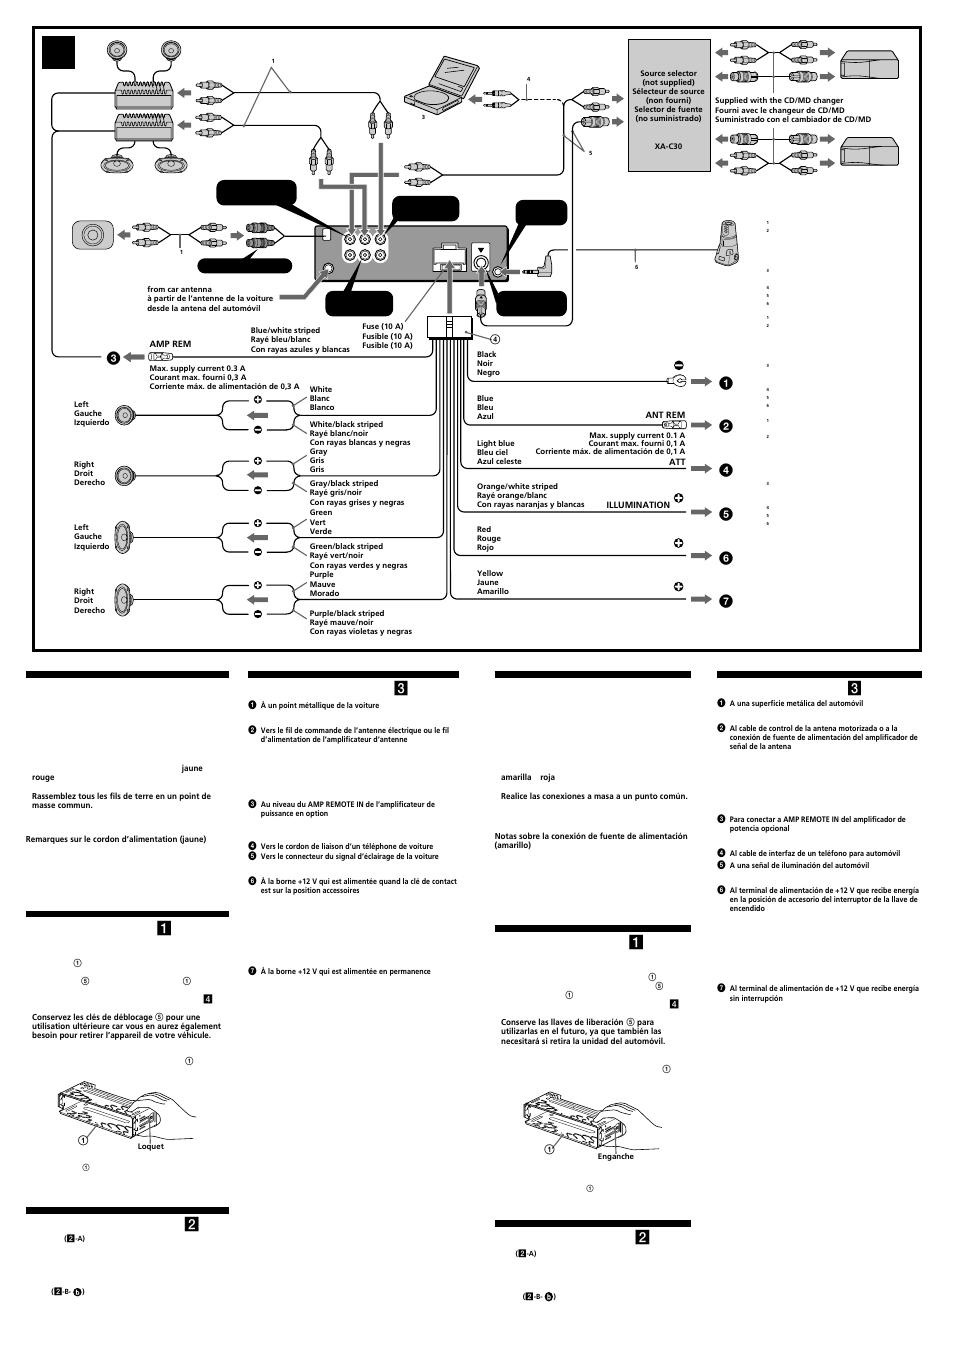 Sony Cdx M8800 Wiring Diagram Trusted Schematics M800 Fm Am Compact Disc Player Car Pictures Prcautions Liste Des Composants 1 Exemple De Raccordement 2 Gt250mp Source Cd